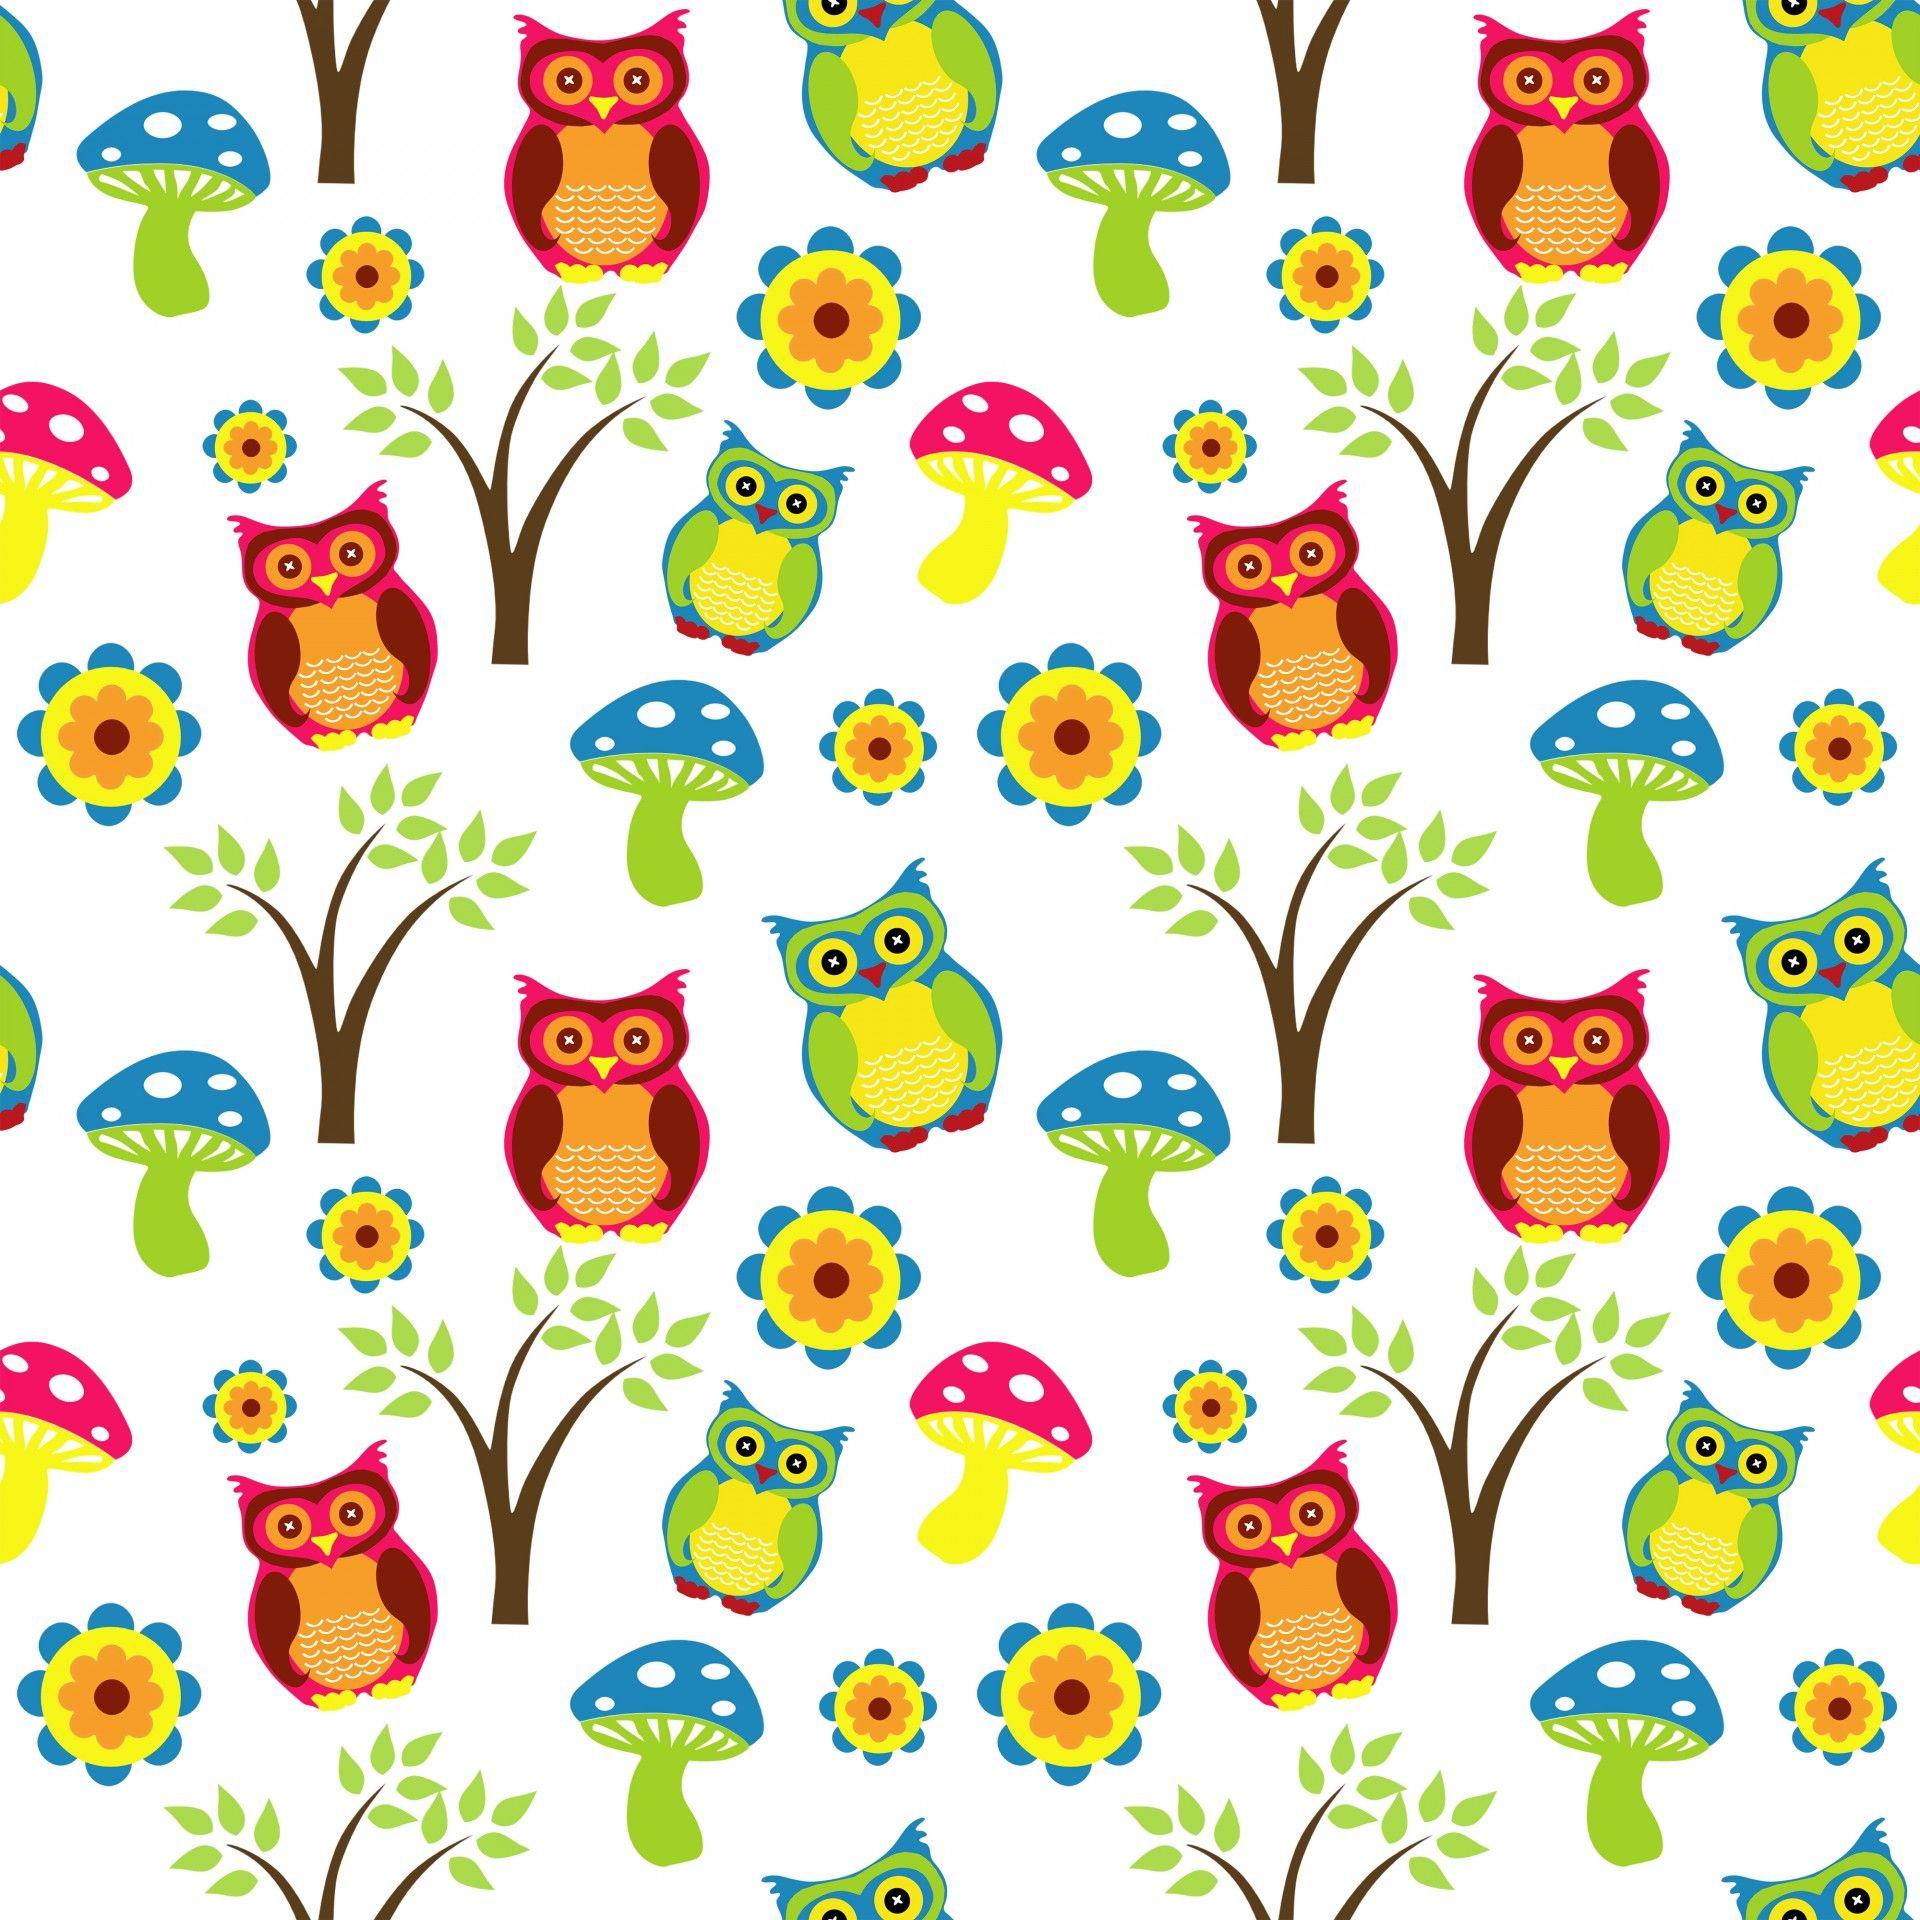 Owls clipart wallpaper.  owl pattern wallpapers